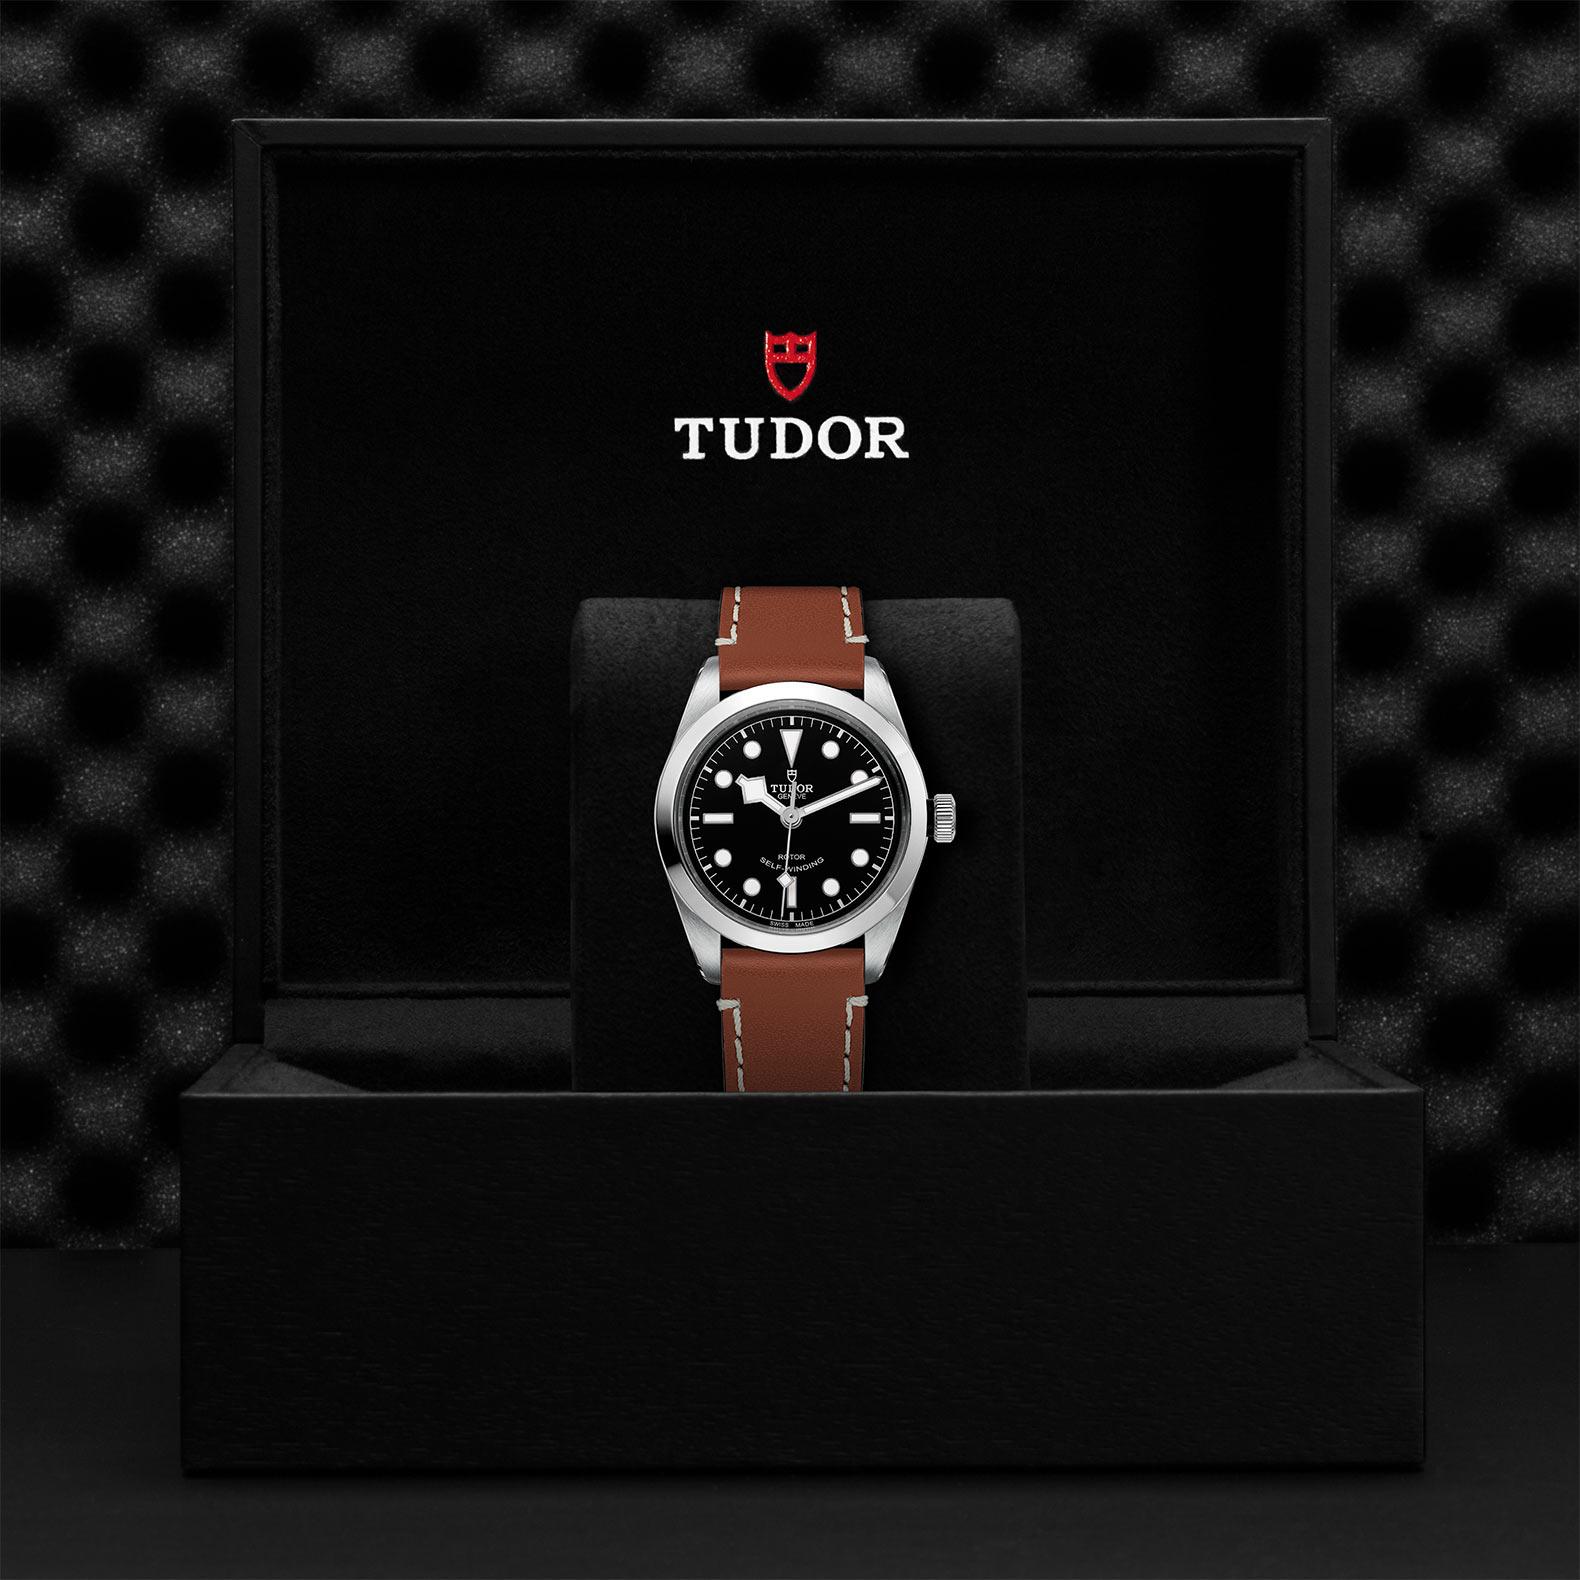 TUDOR Black Bay 36 M79500 0009 Presentation